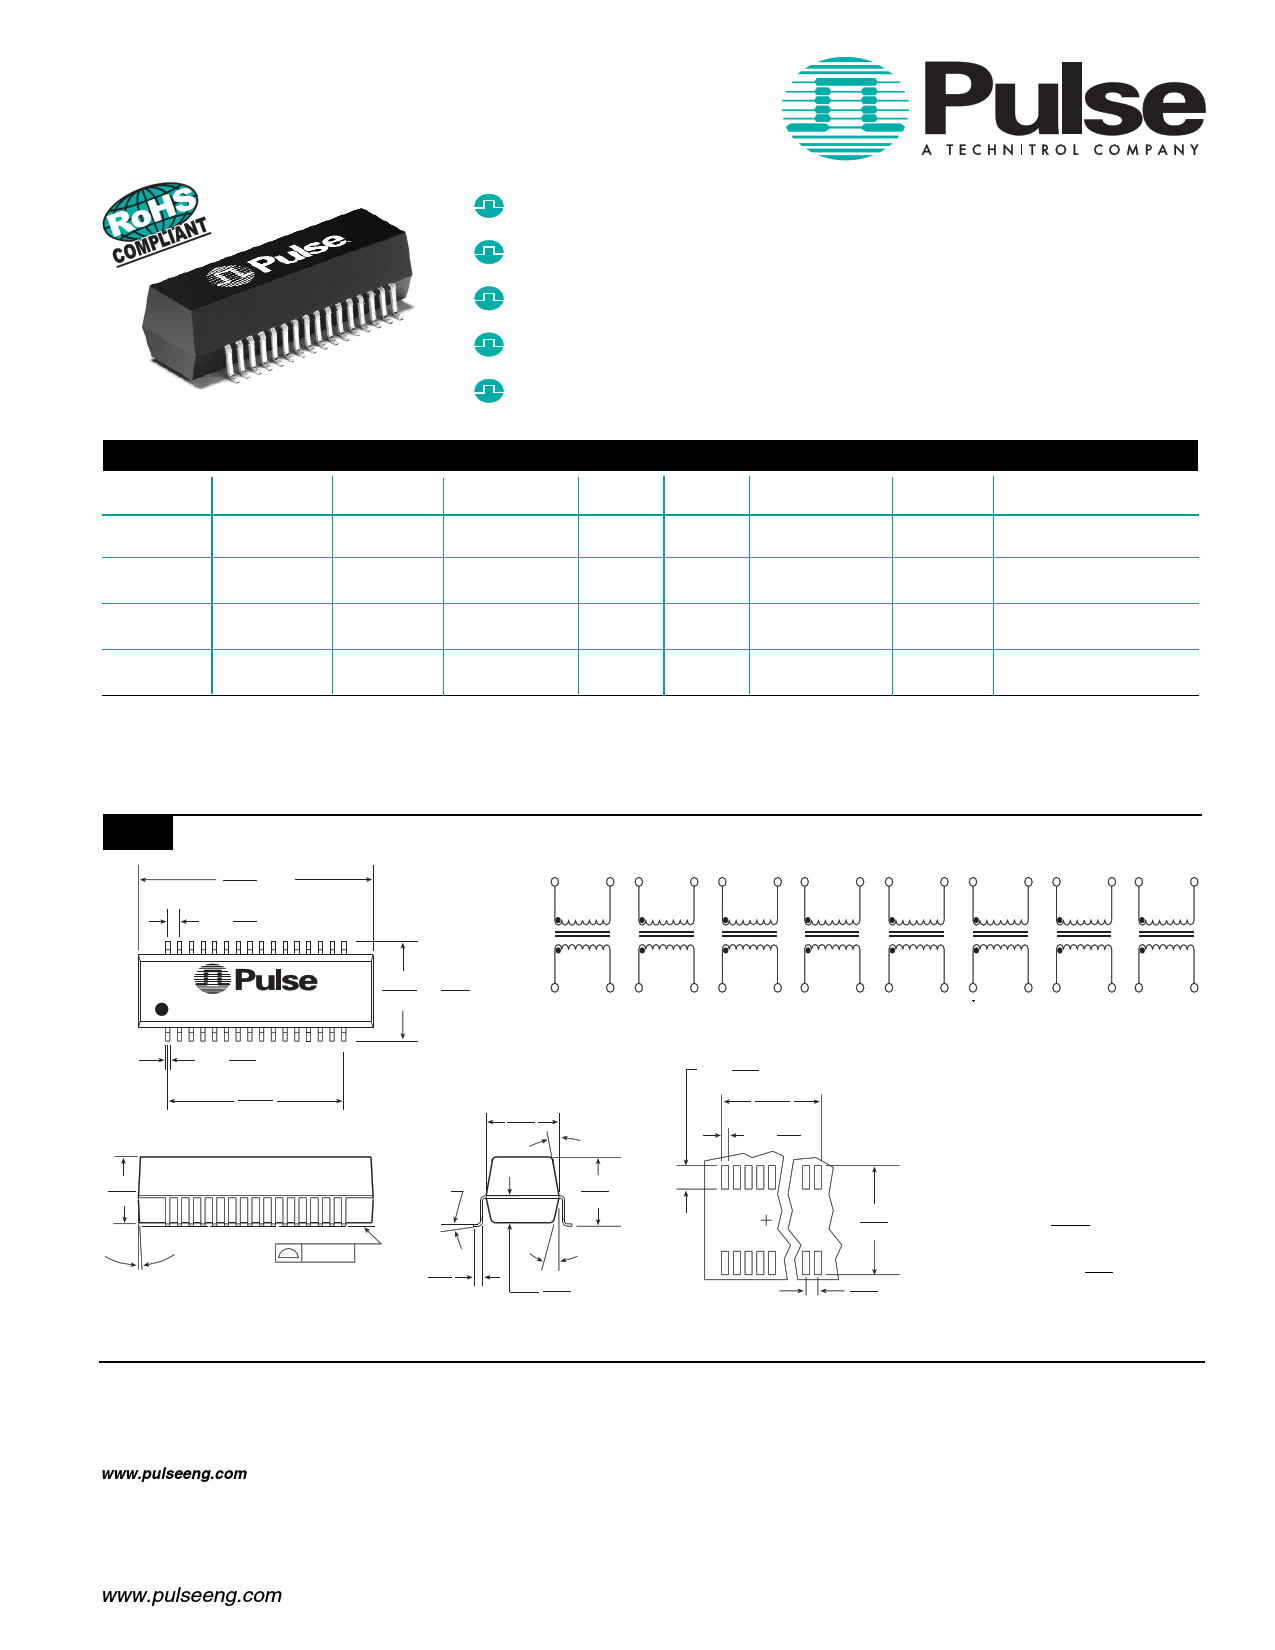 T3049 데이터시트 및 T3049 PDF